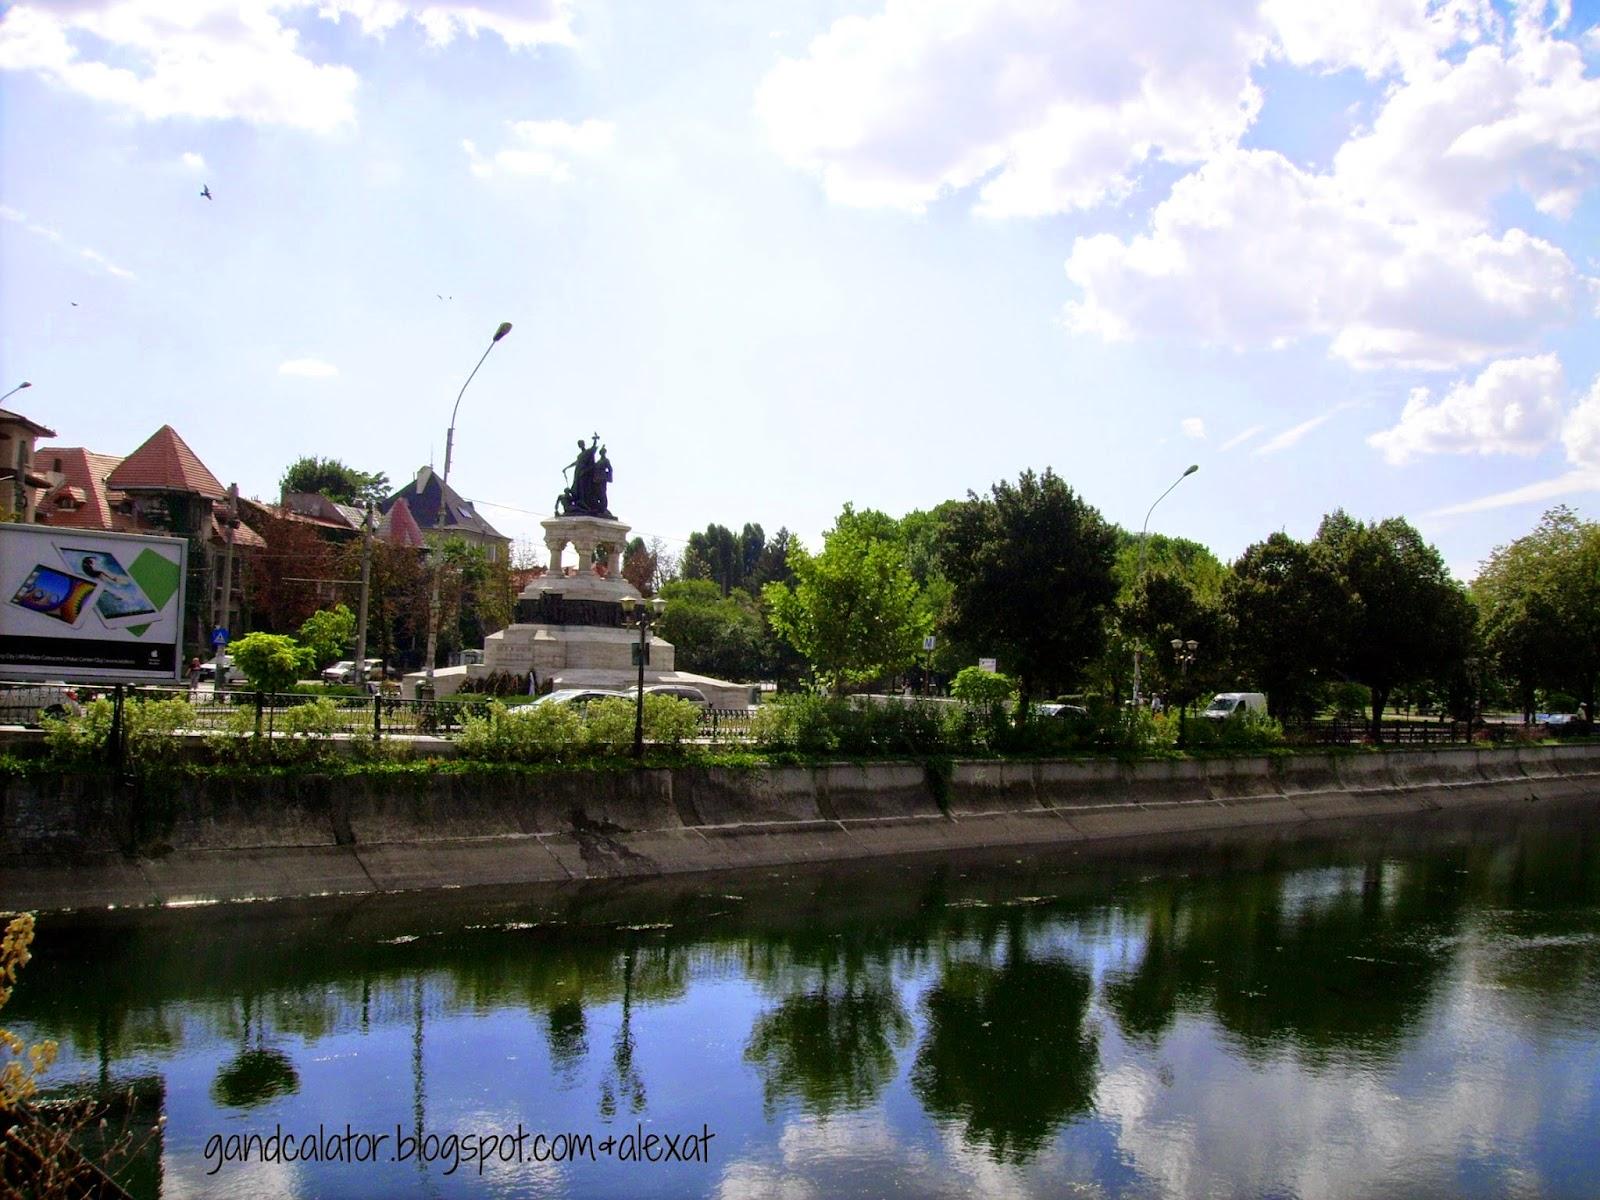 Reflection on the water surface of Dambovita River. Reflecția pe suprafața apei râului Dâmbovița.